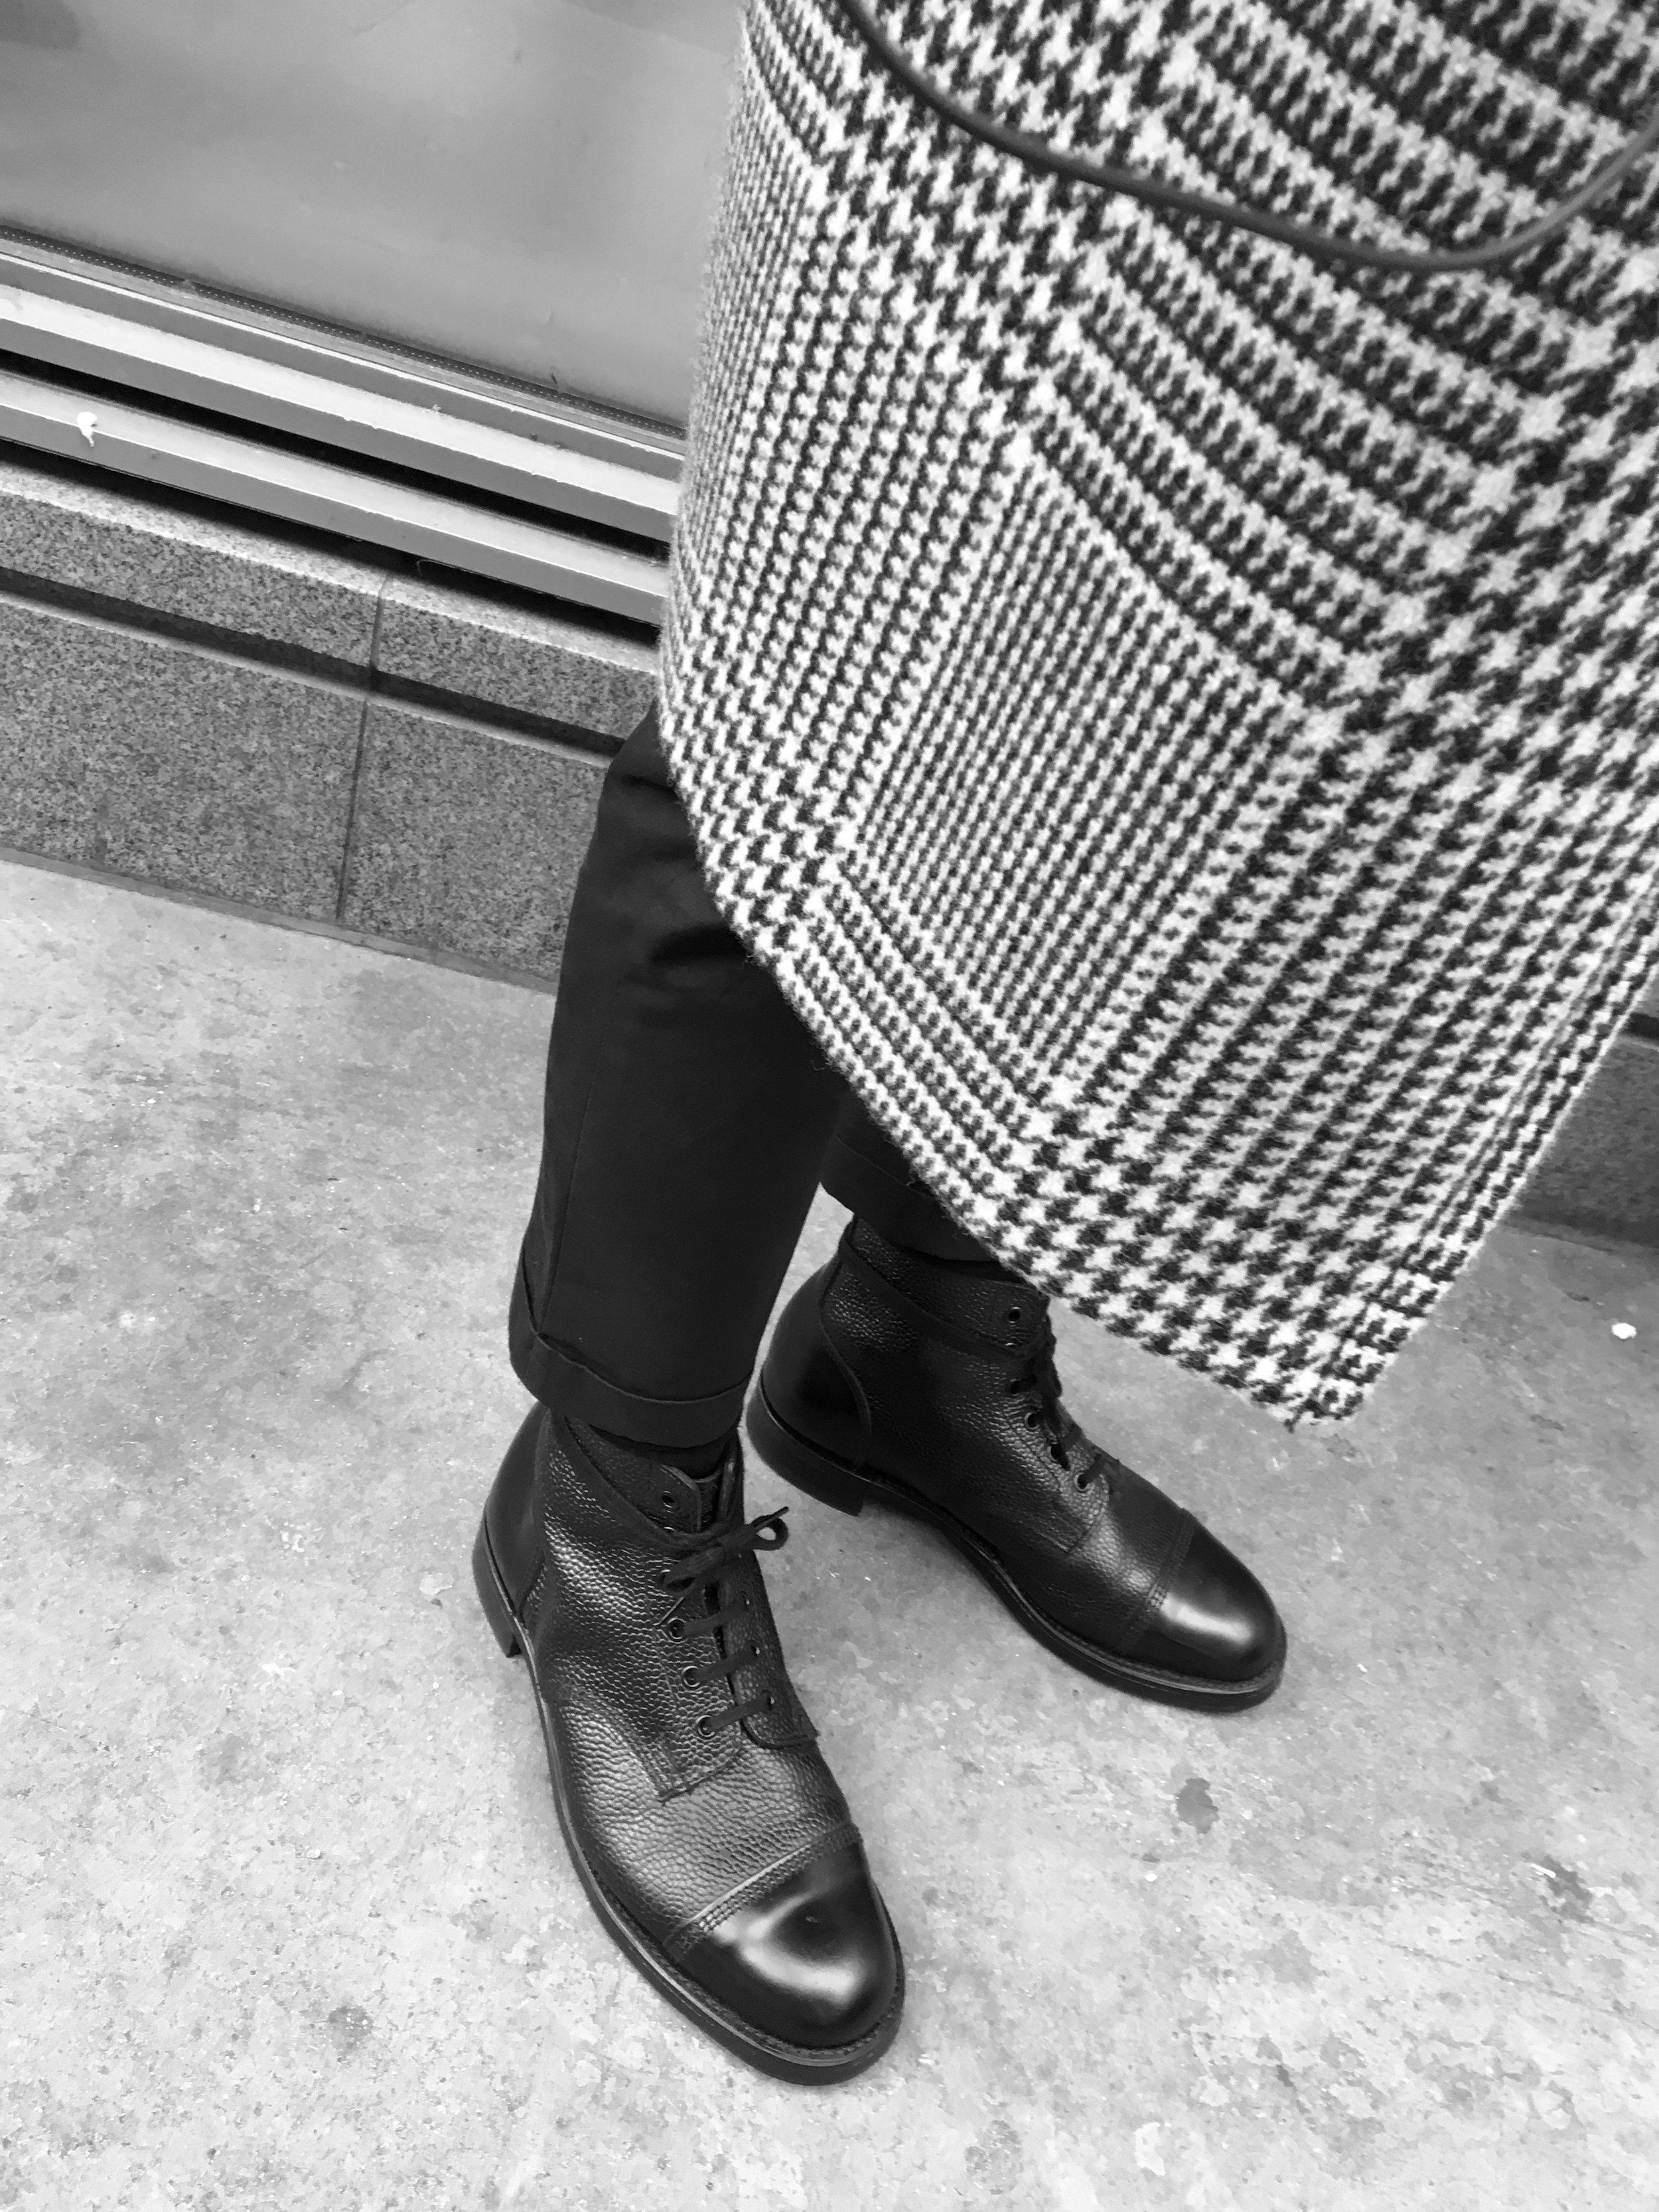 Casual snob Sanders Boots.JPG